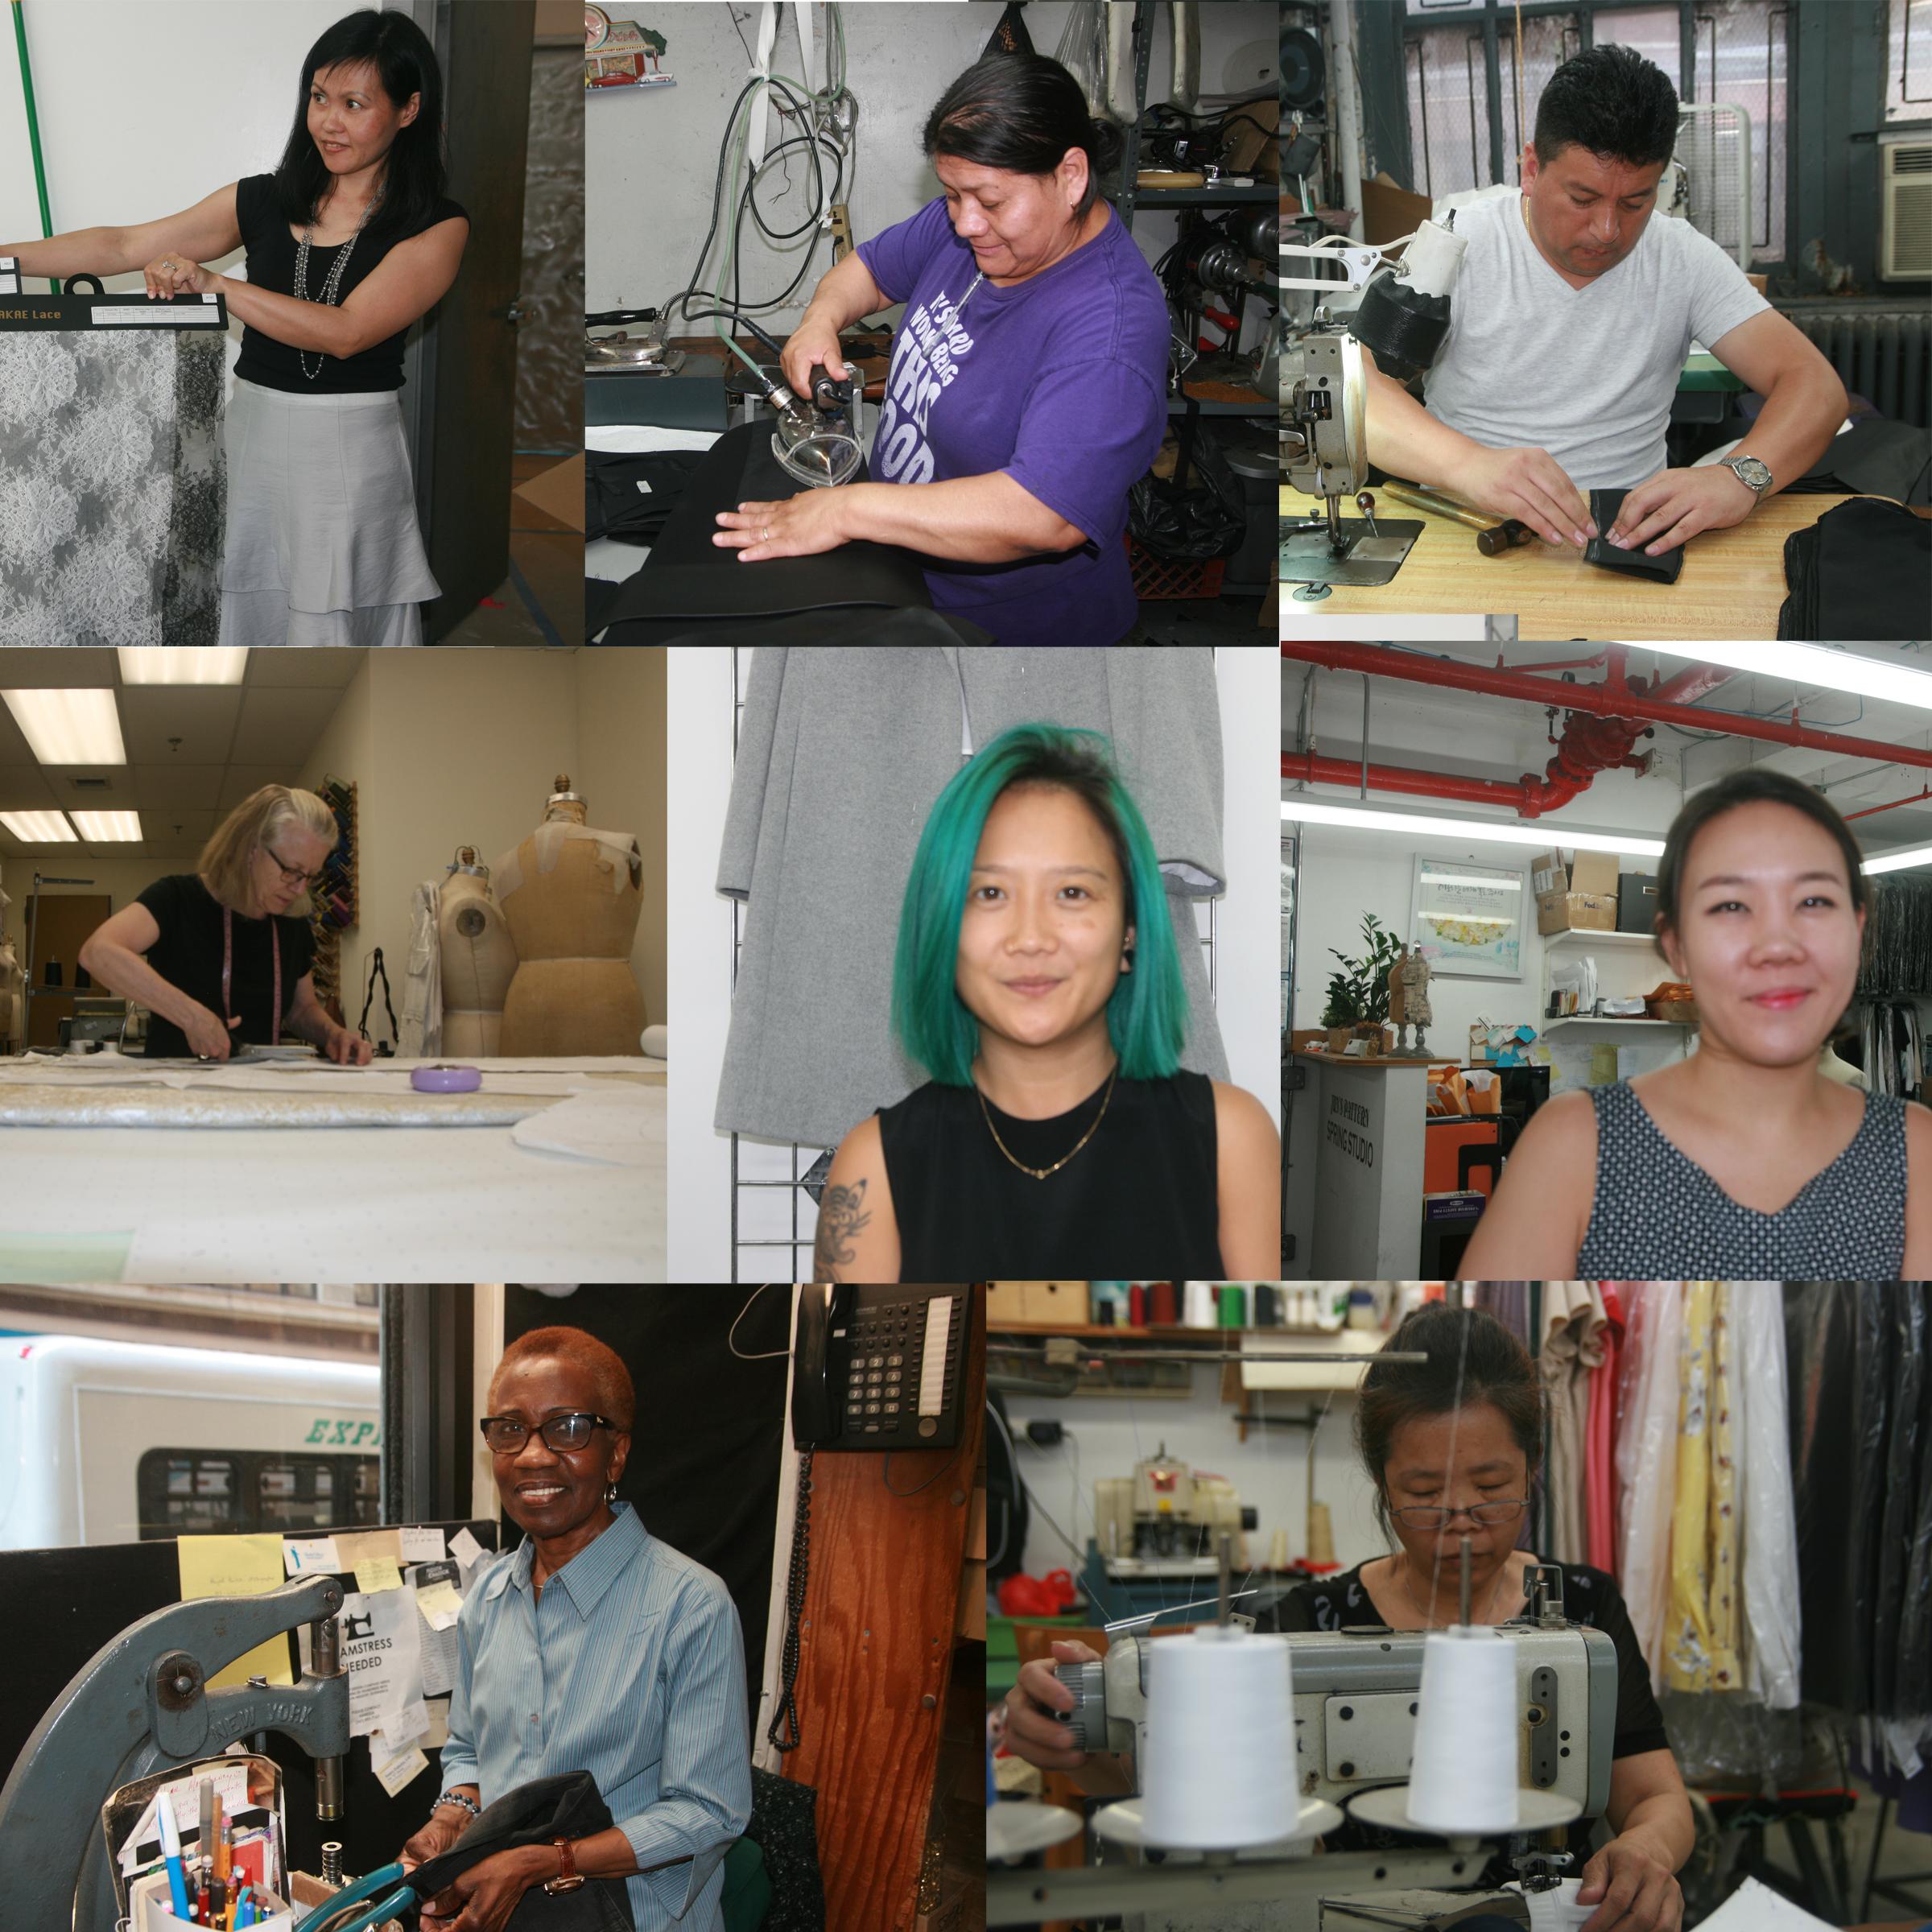 women_at_work.jpg